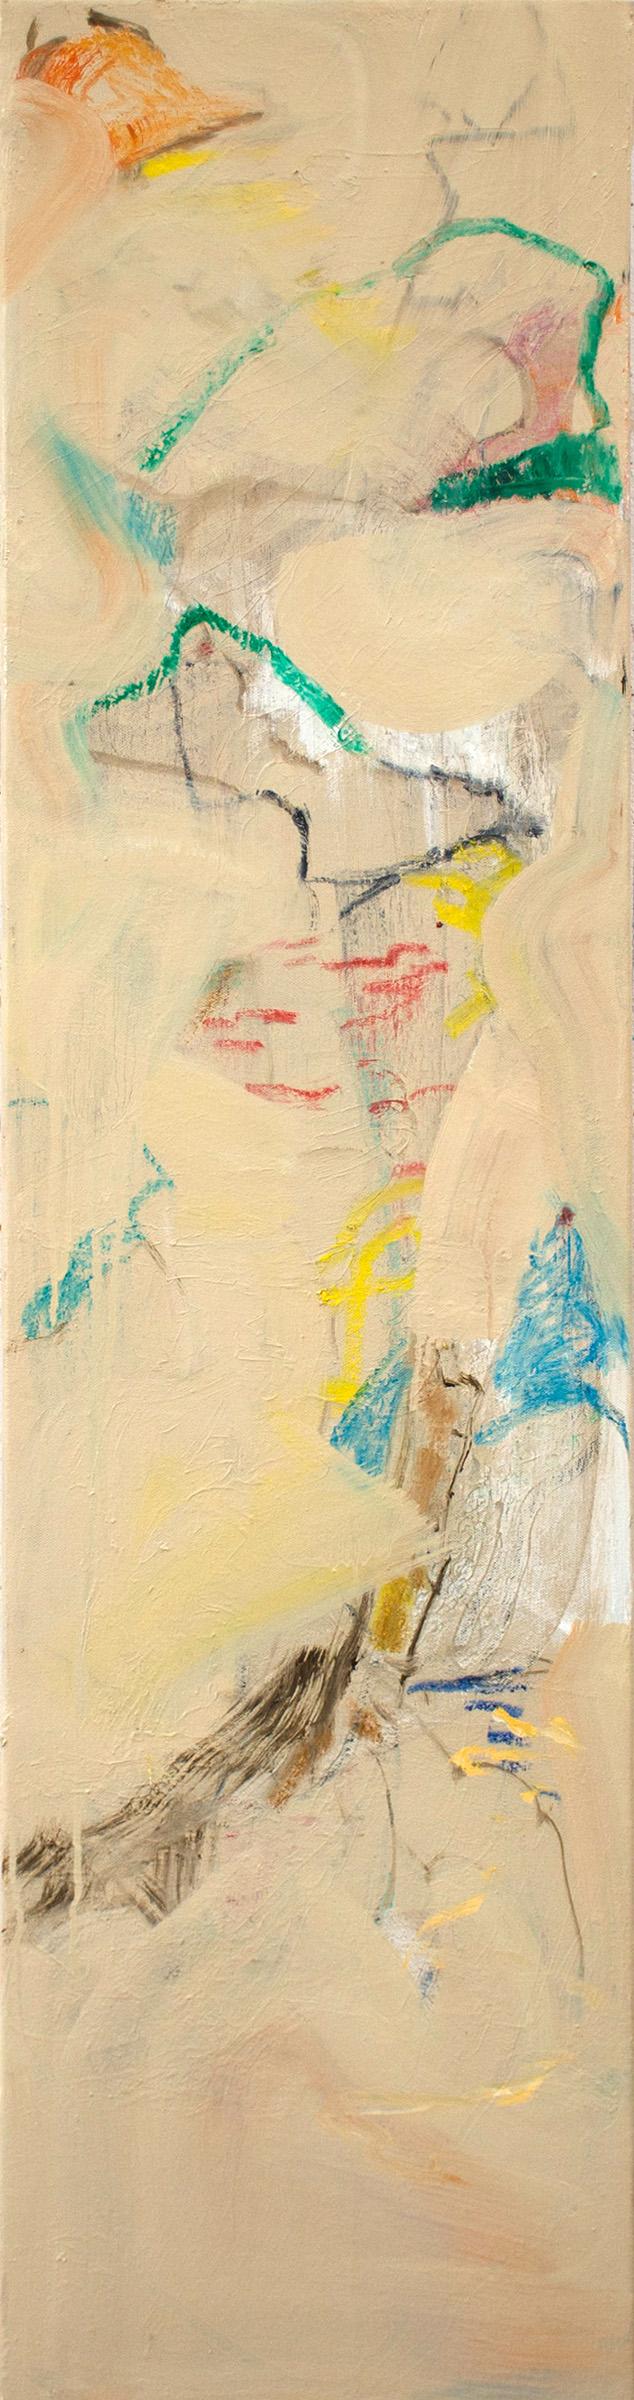 "duckbill   48 x 12"" oil & oil stick on canvas, 2019"